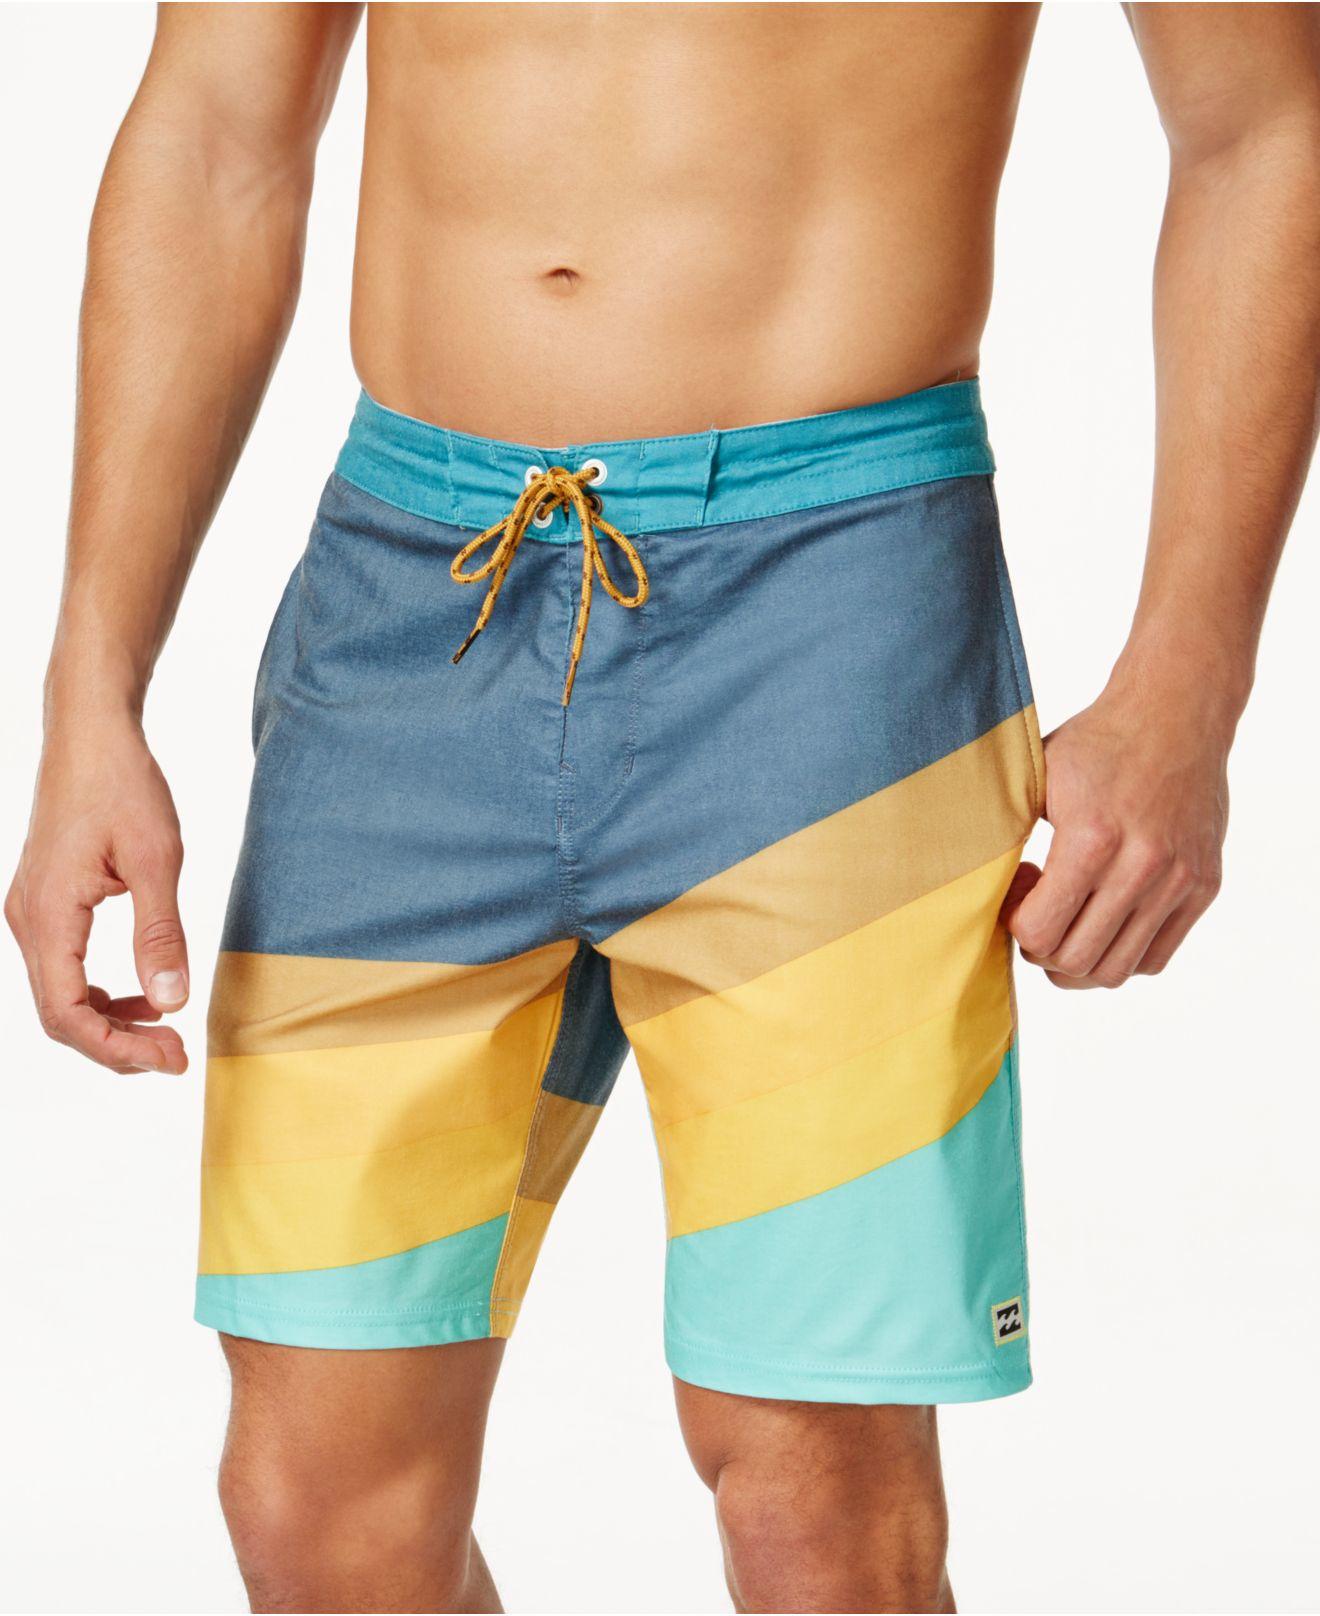 6b5d54eb6f Swimwear, Surfwear & Wetsuits BILLABONG Mens Board Shorts